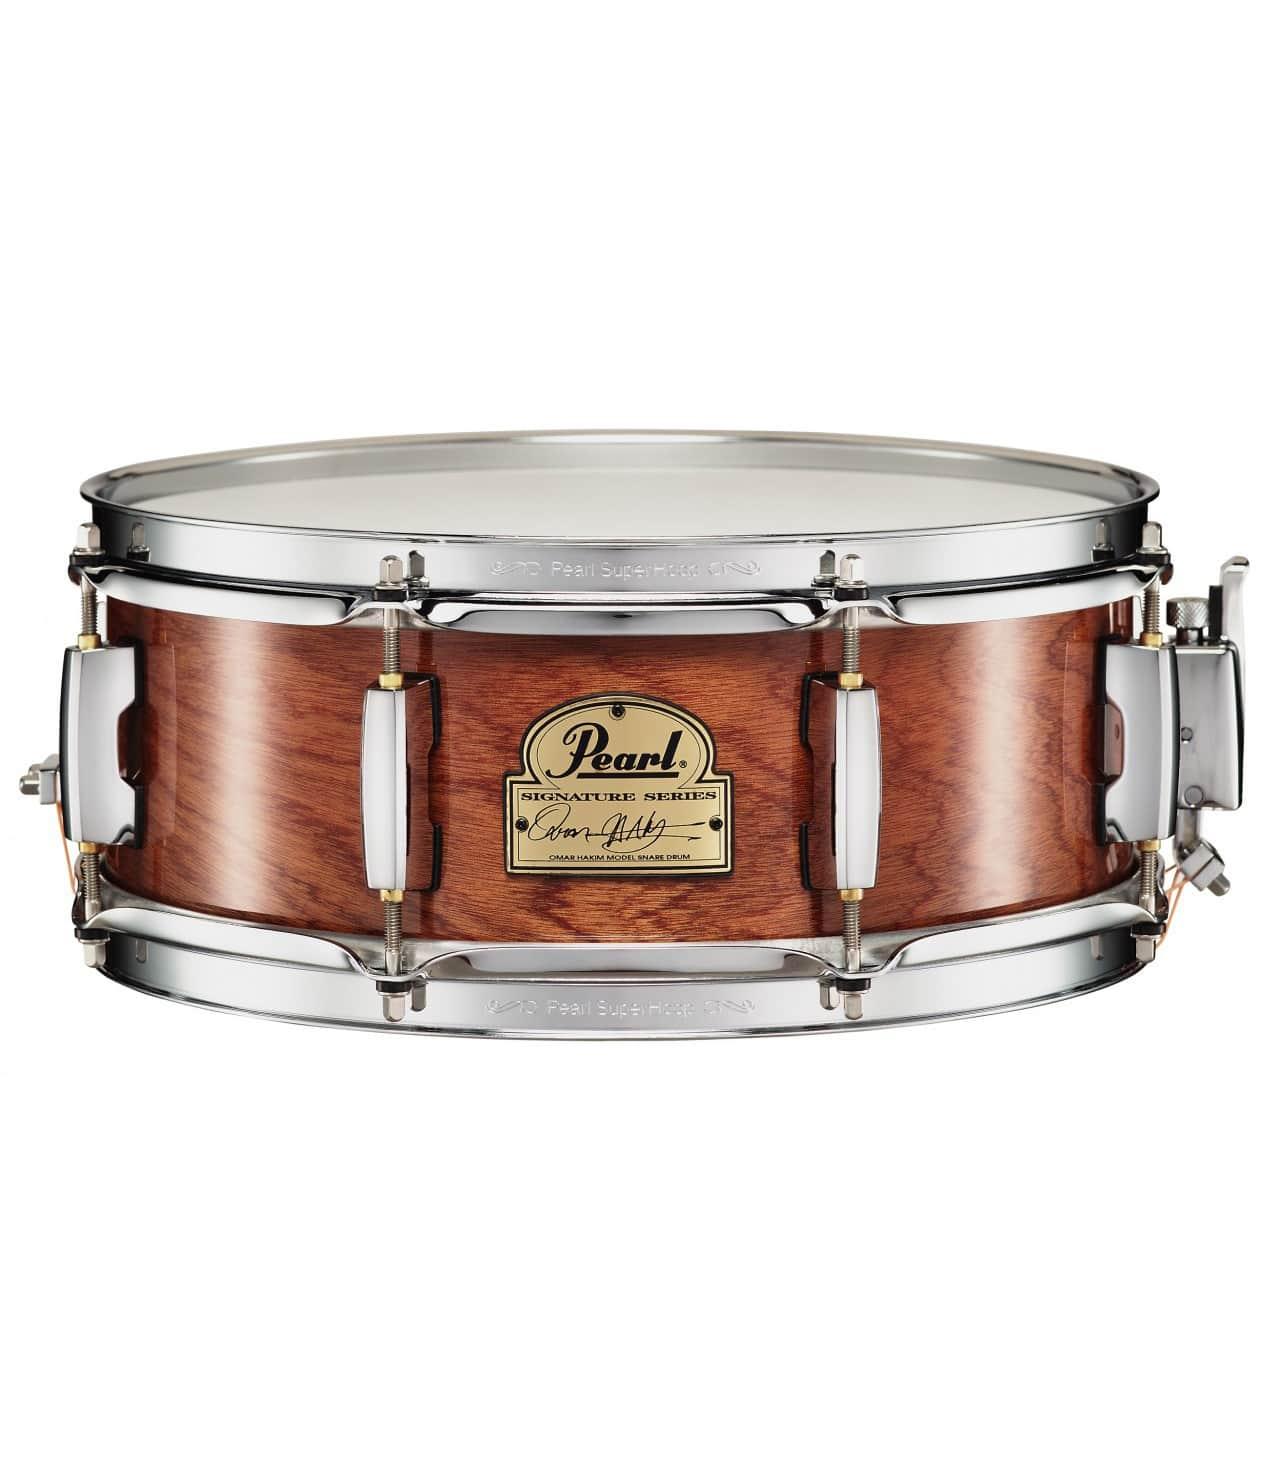 buy pearl oh1350 140 omar hakim 13x5 0 snare drum